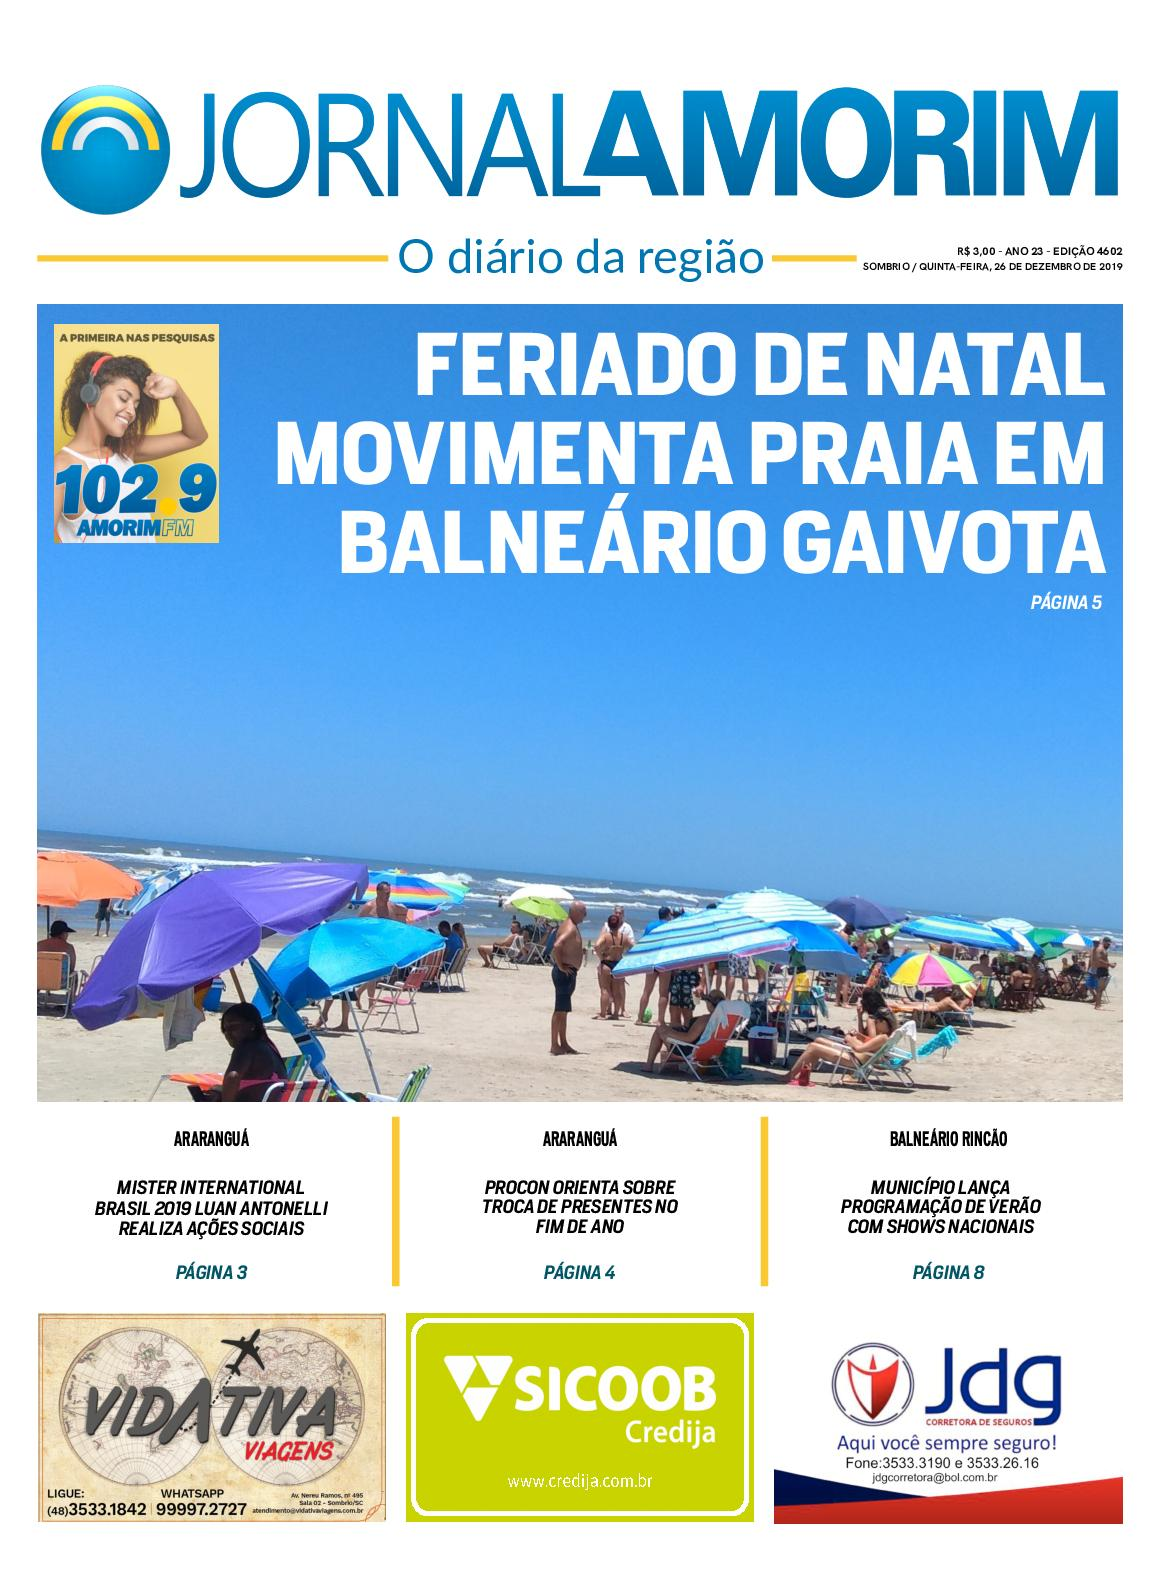 Jornal Amorim 4602 Quinta 26 12 19